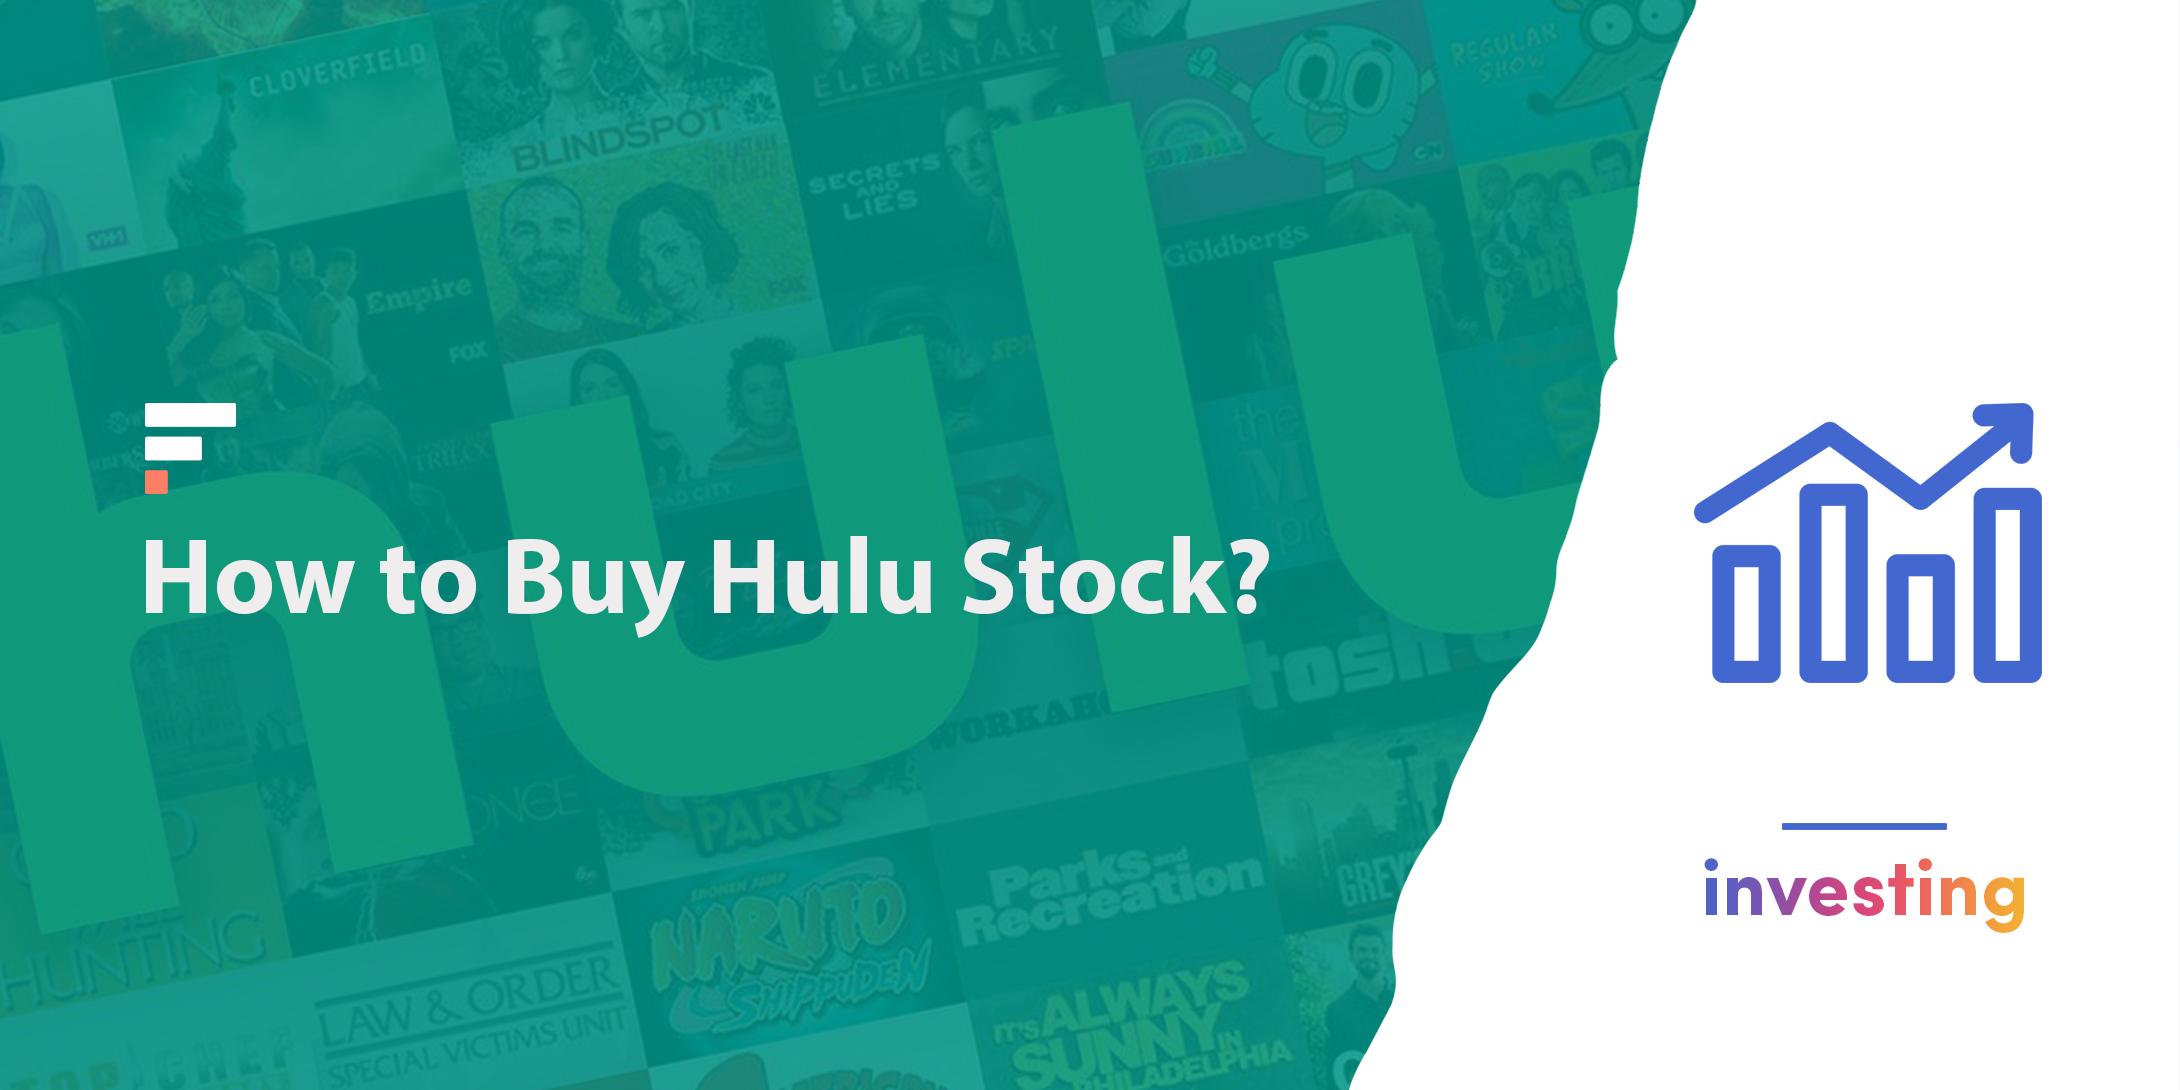 How to buy Hulu stock?